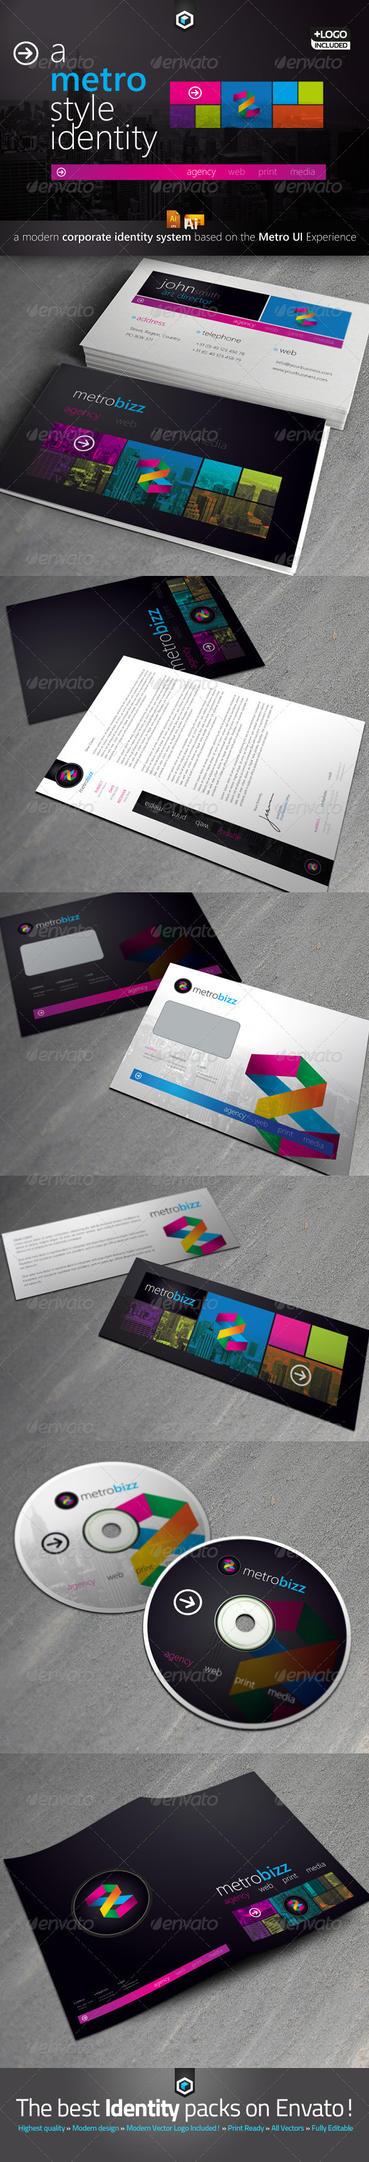 RW Metro UI Style Modern Corporate Identity by Reclameworks